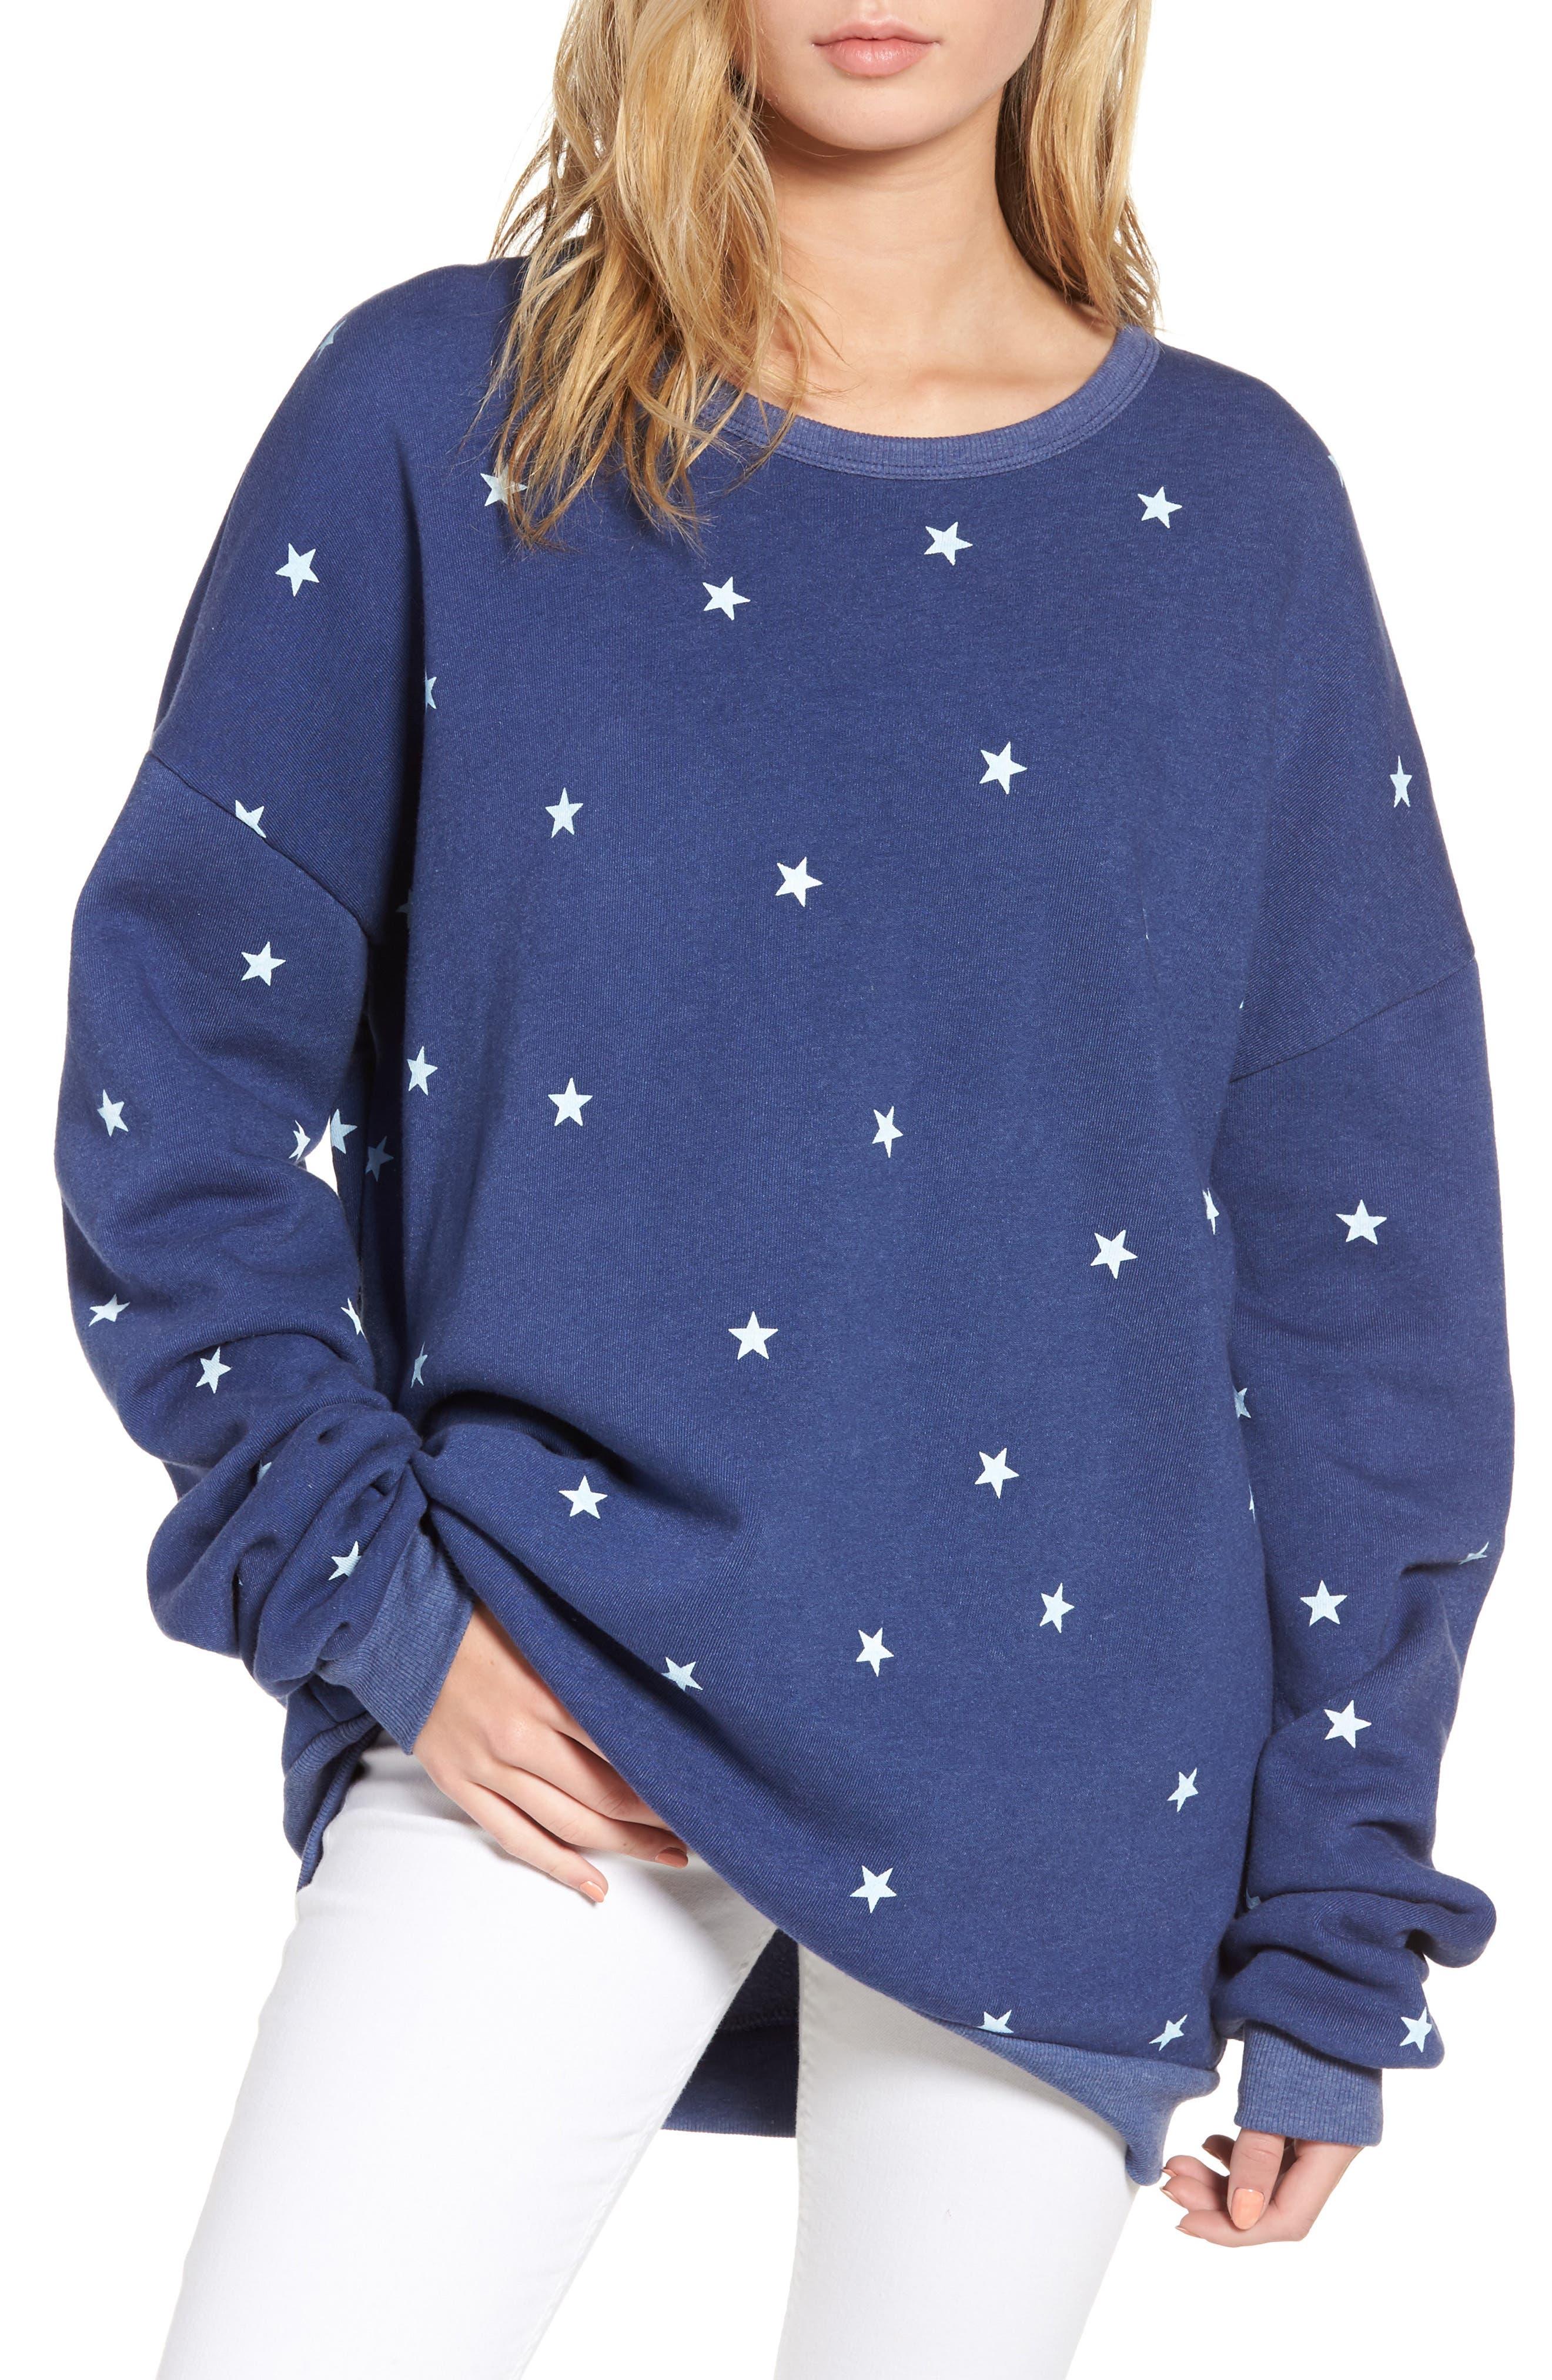 Wildfox Star Tunic Sweatshirt